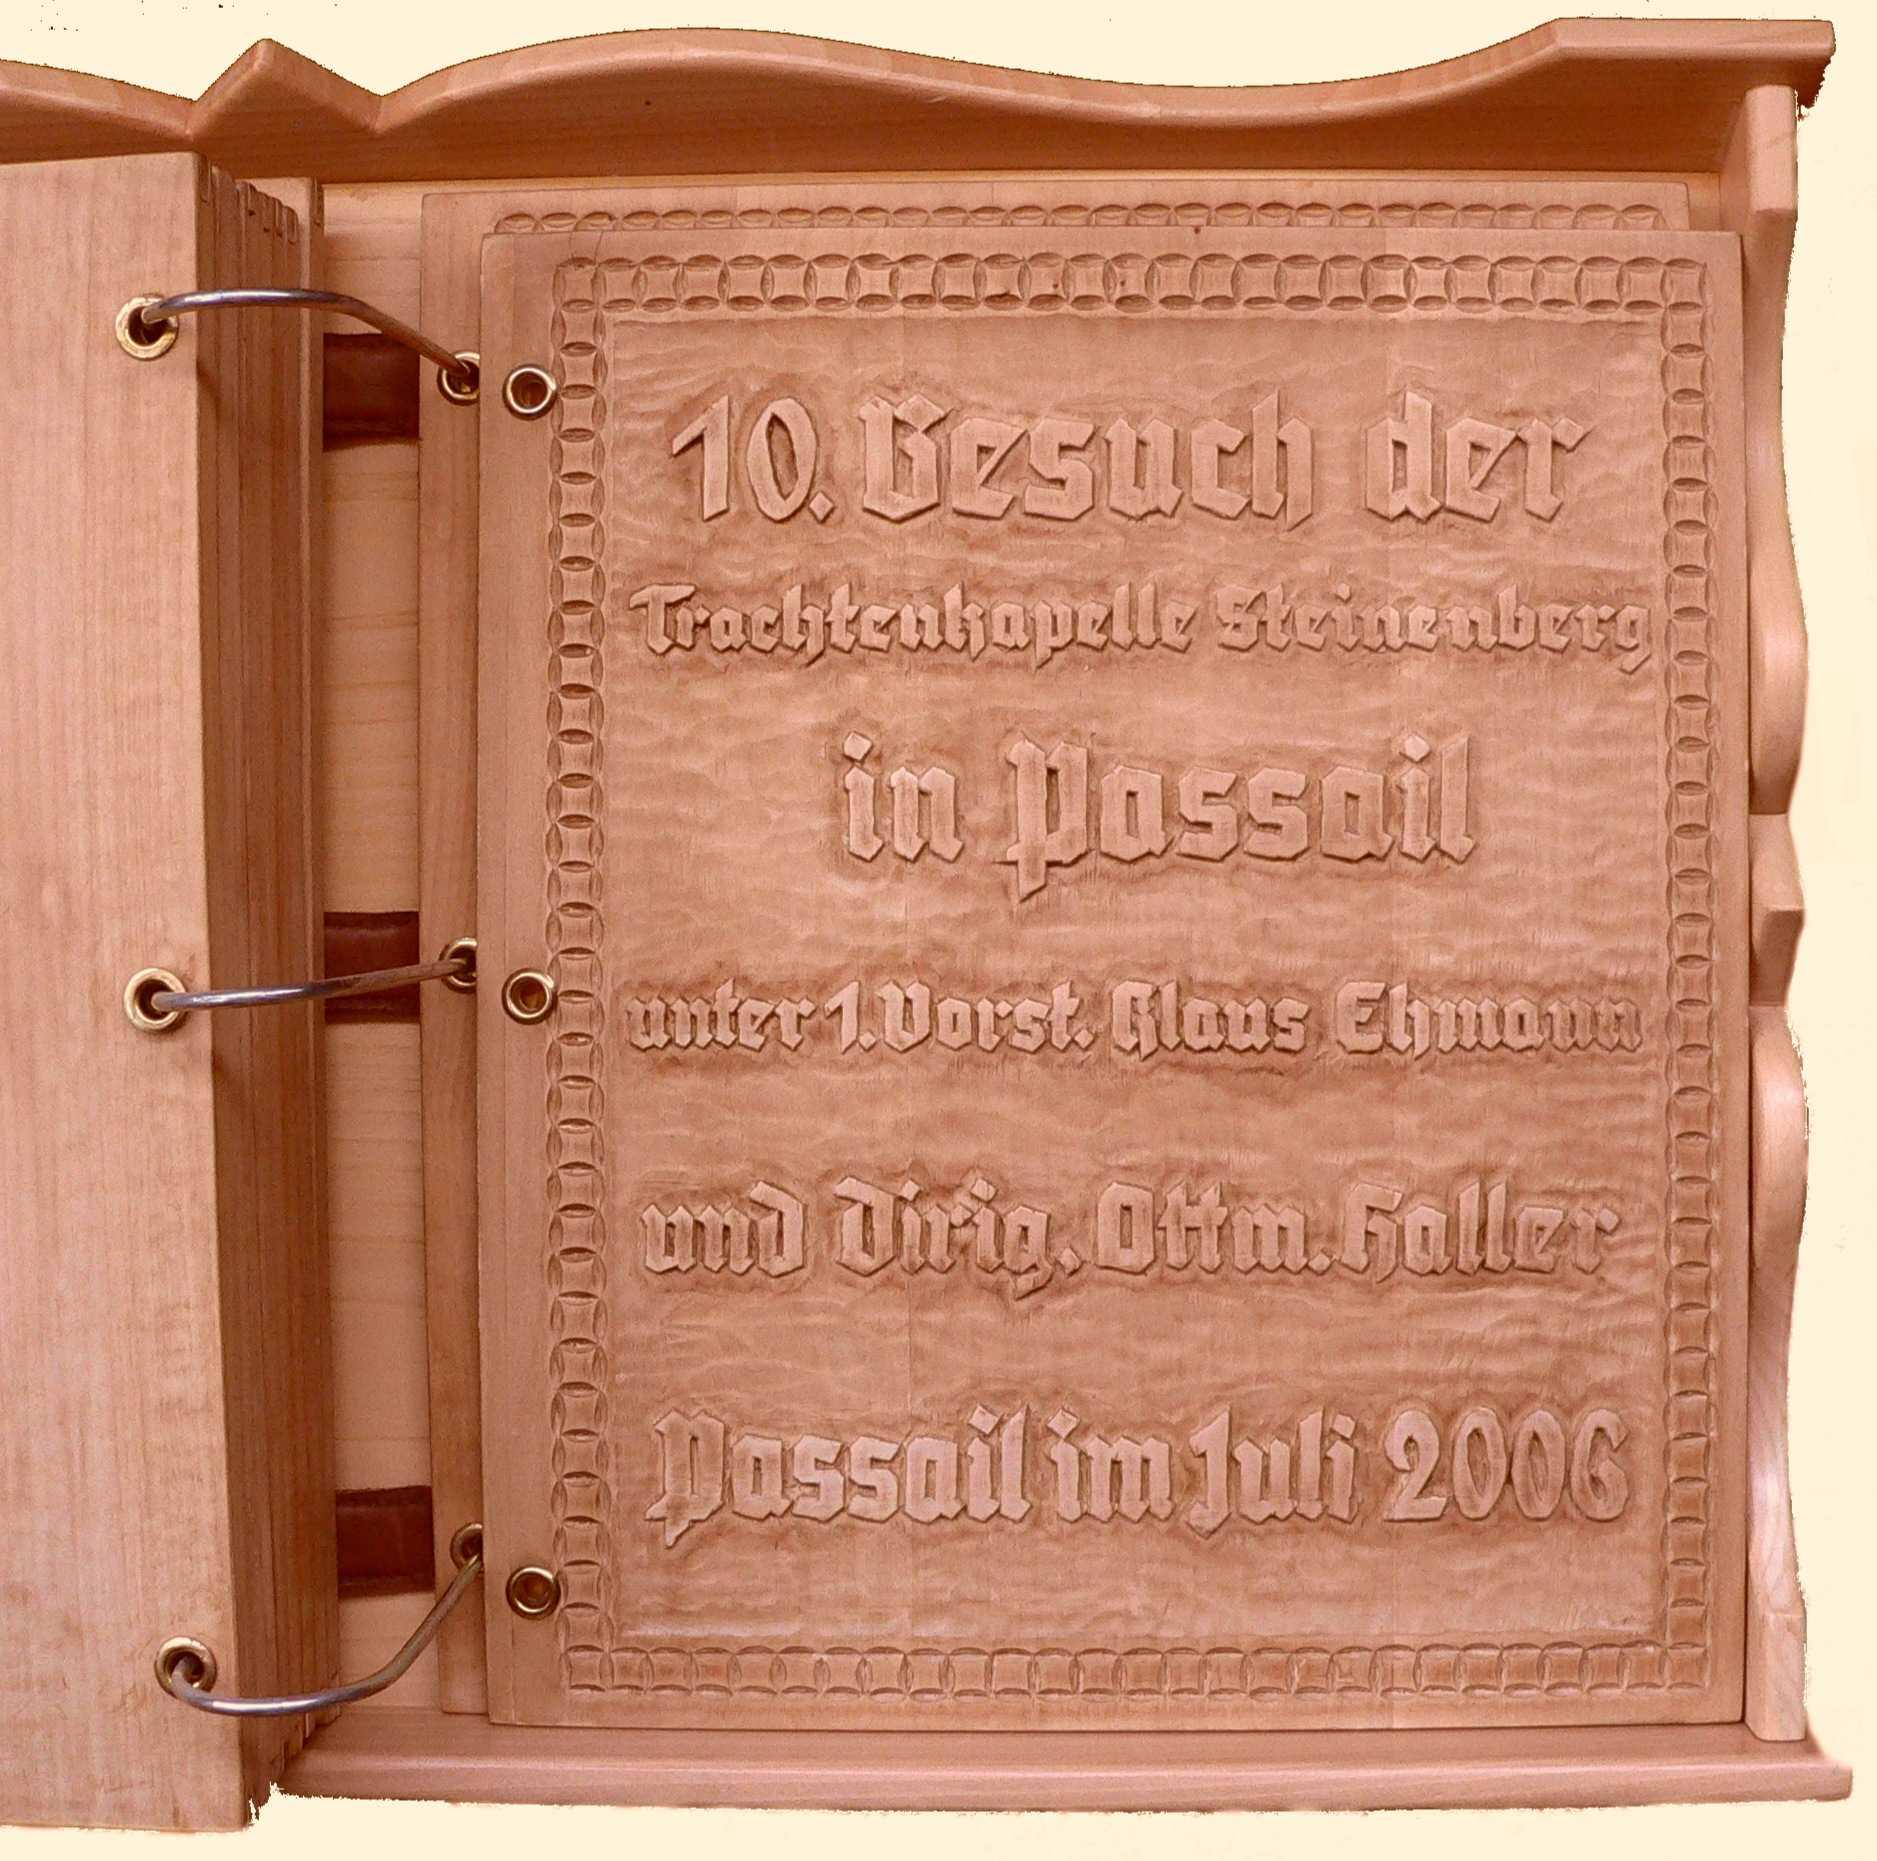 Passail_Buch12.1